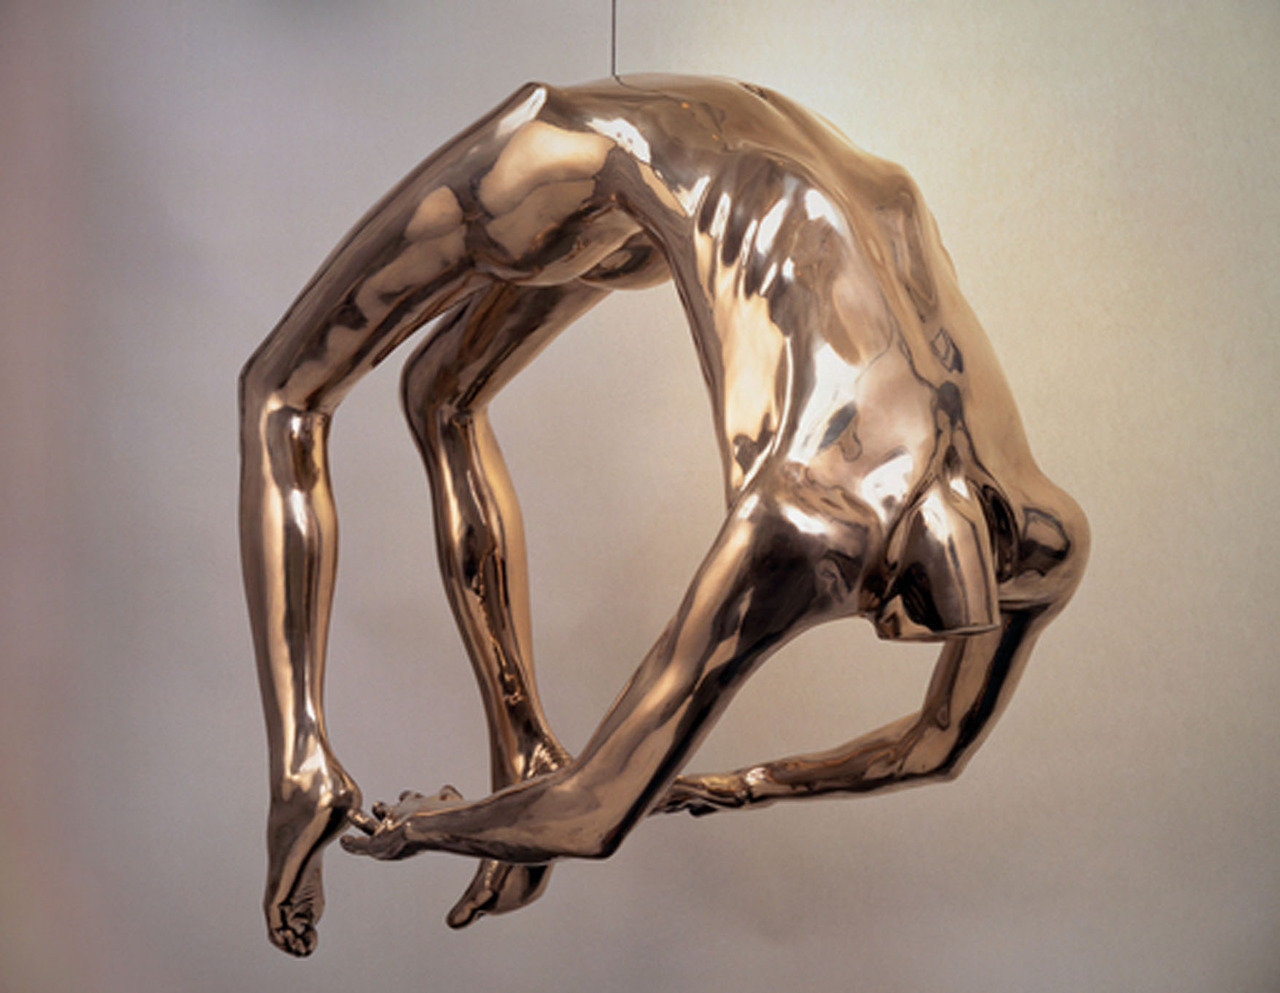 Nudity nude salo art underage horses model